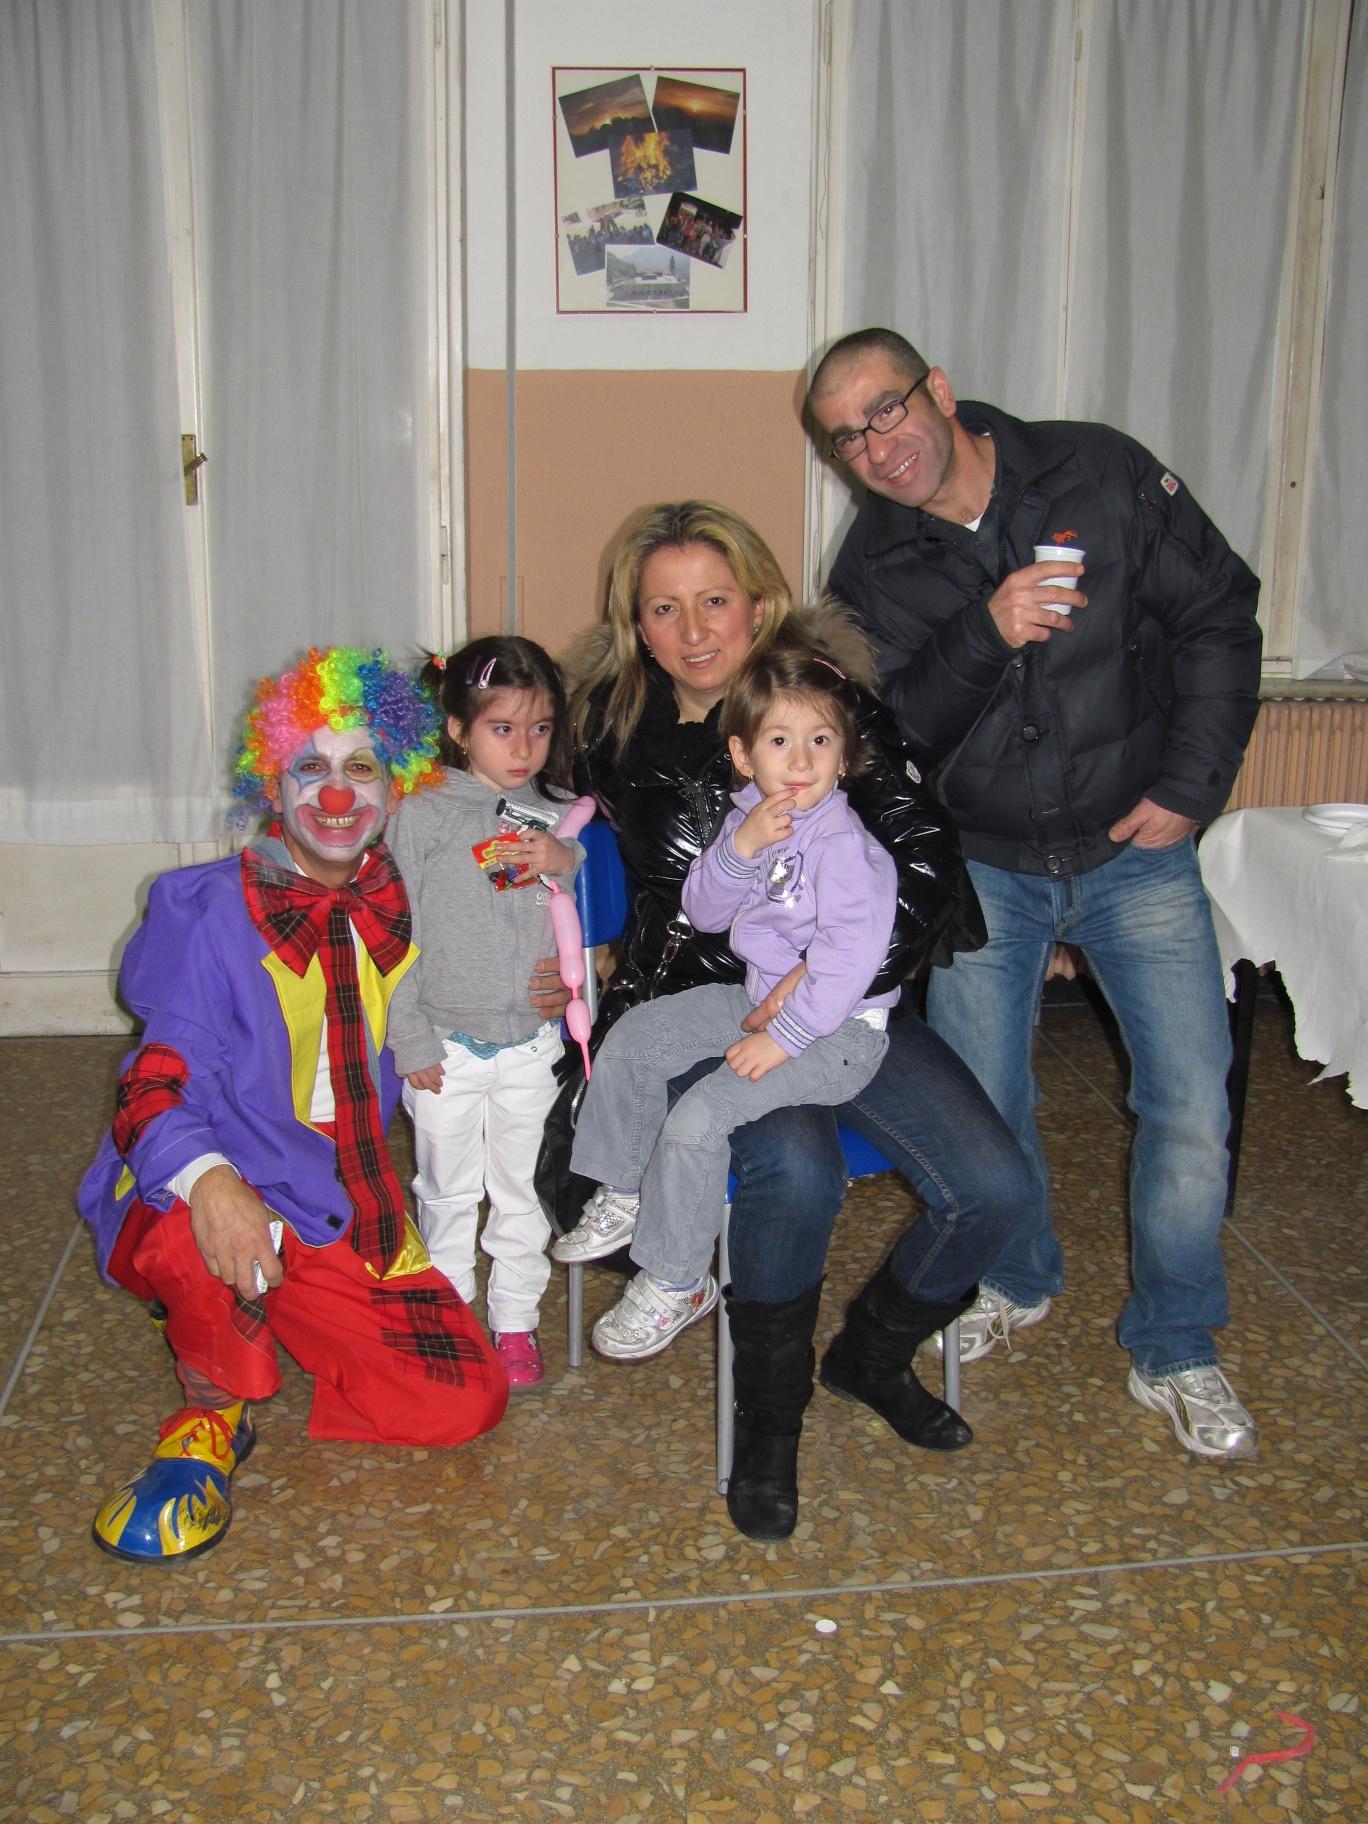 ricordo_battesimo_gesu_2011-01-23-17-35-28